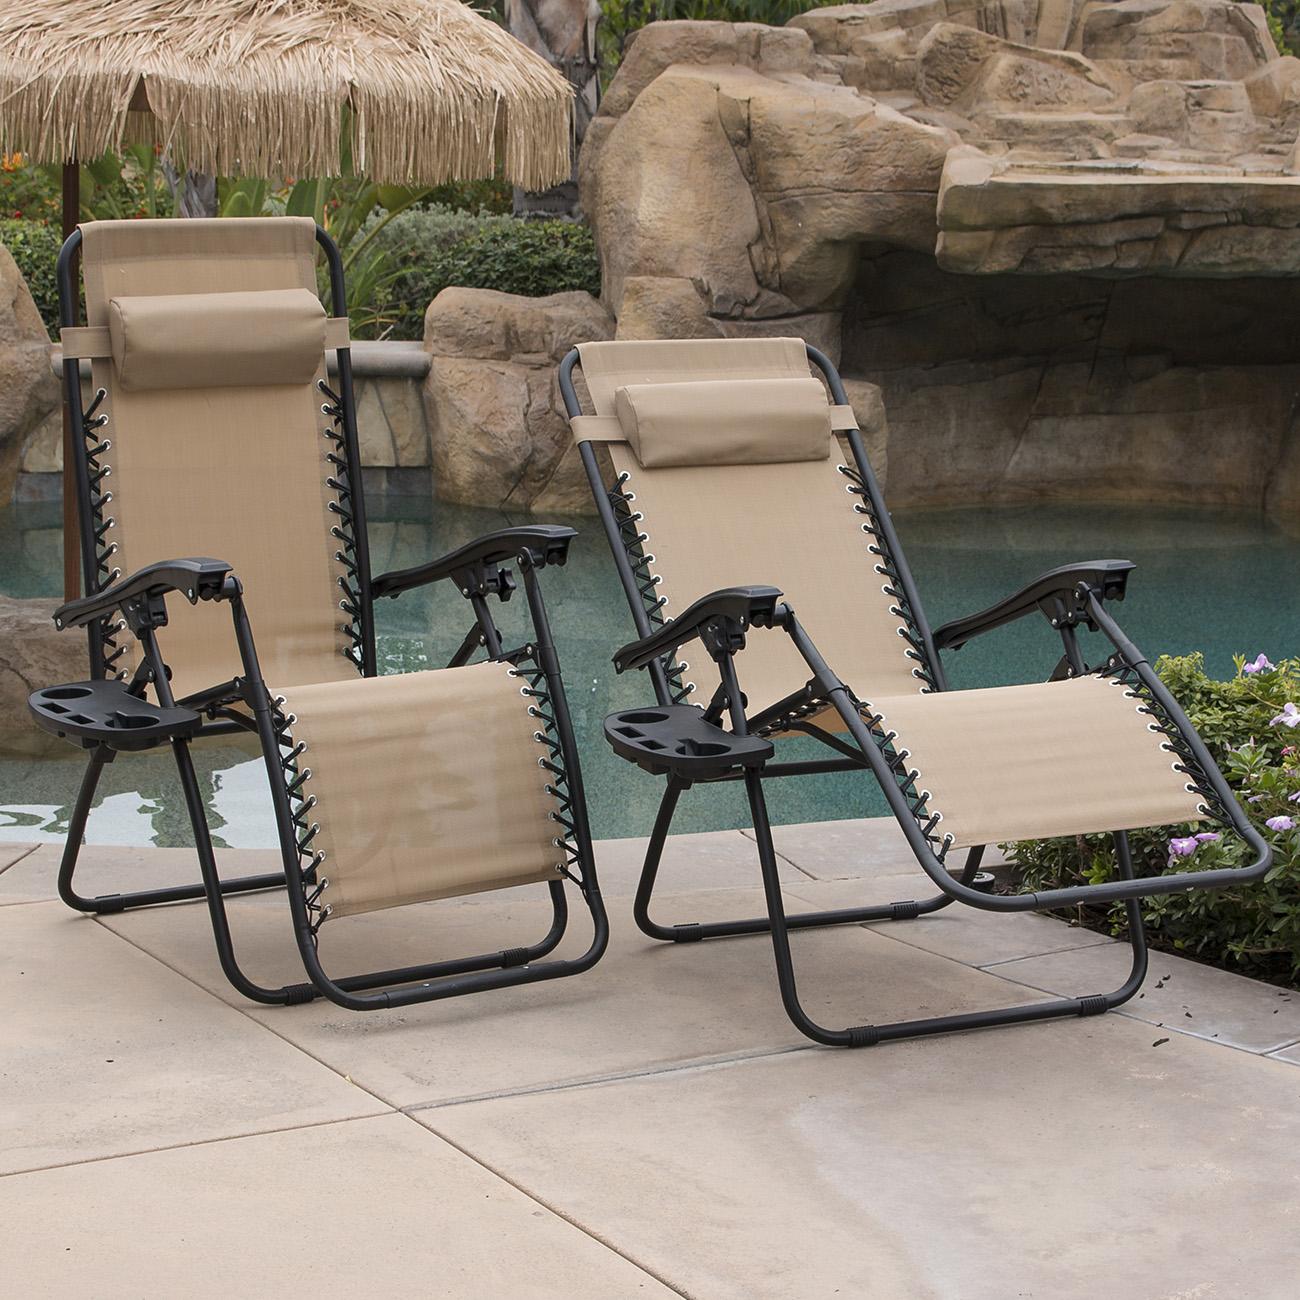 Amazing Zero Gravity Chairs Case Of (2) Tan Lounge Patio Chairs Outdoor Yard Beach  New